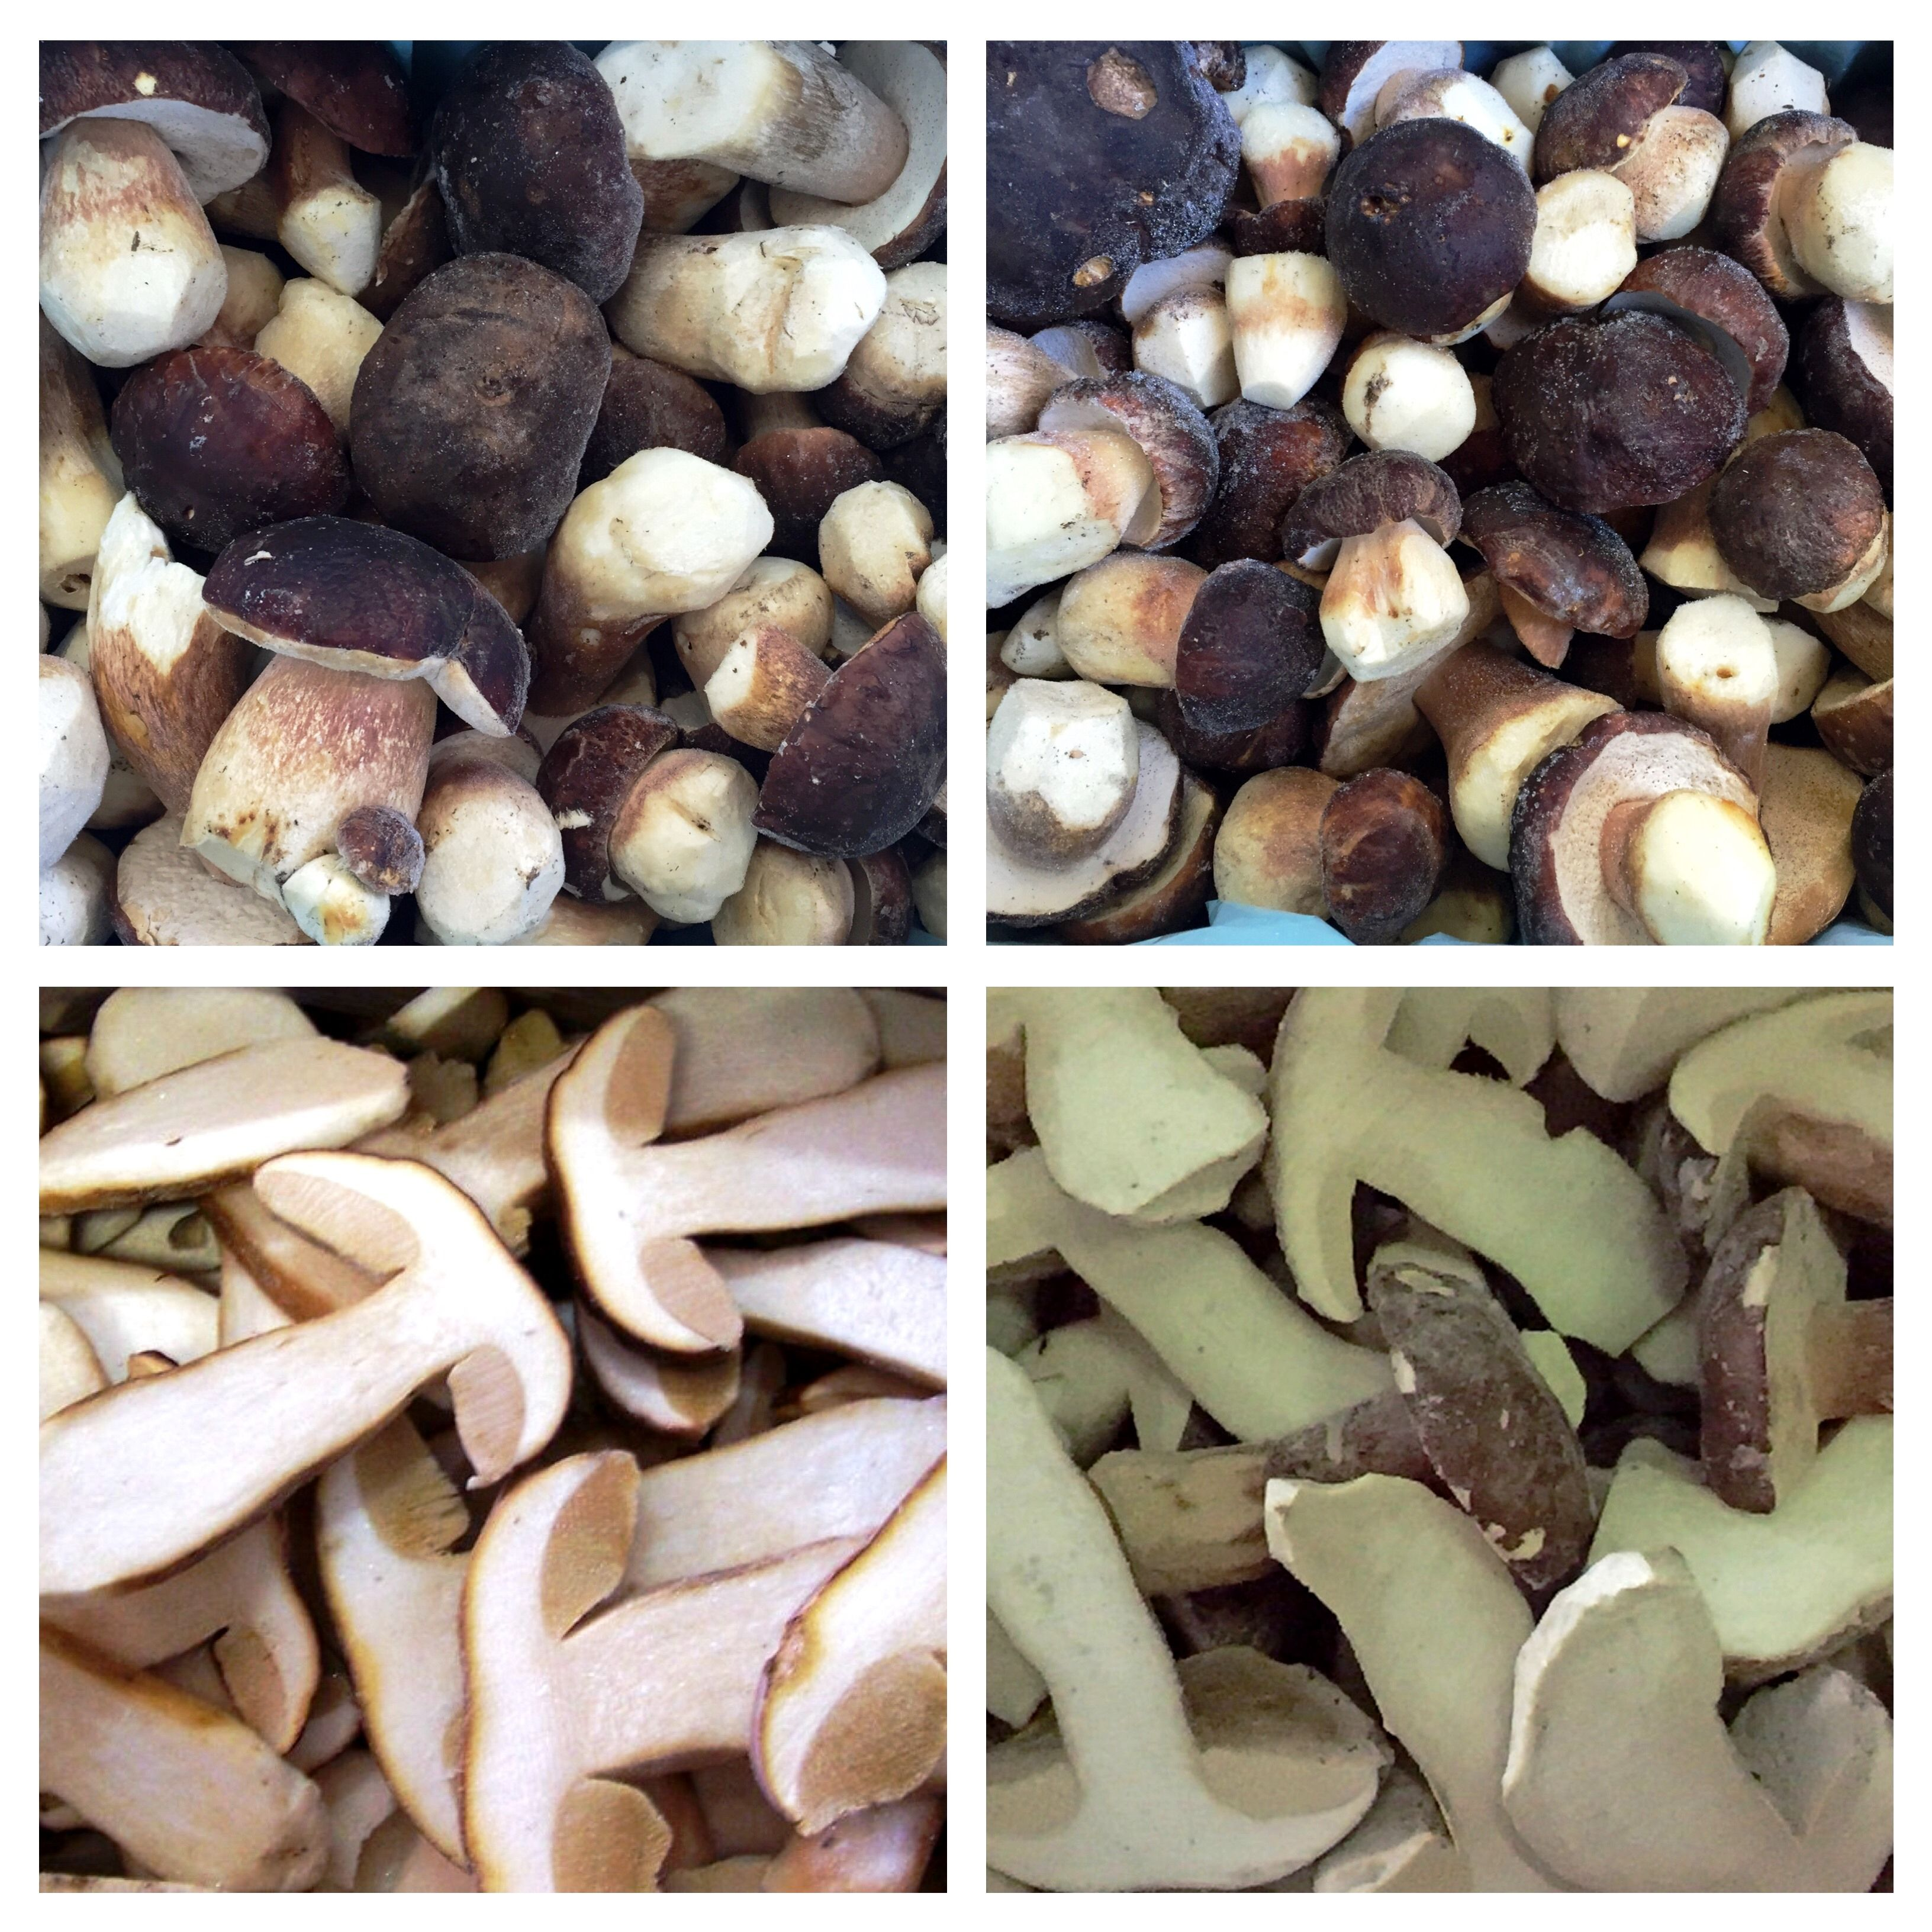 Porcini mushrooms frozen, whole, half and sliced. Aleramica Funghi Ltd. 03-04-2015